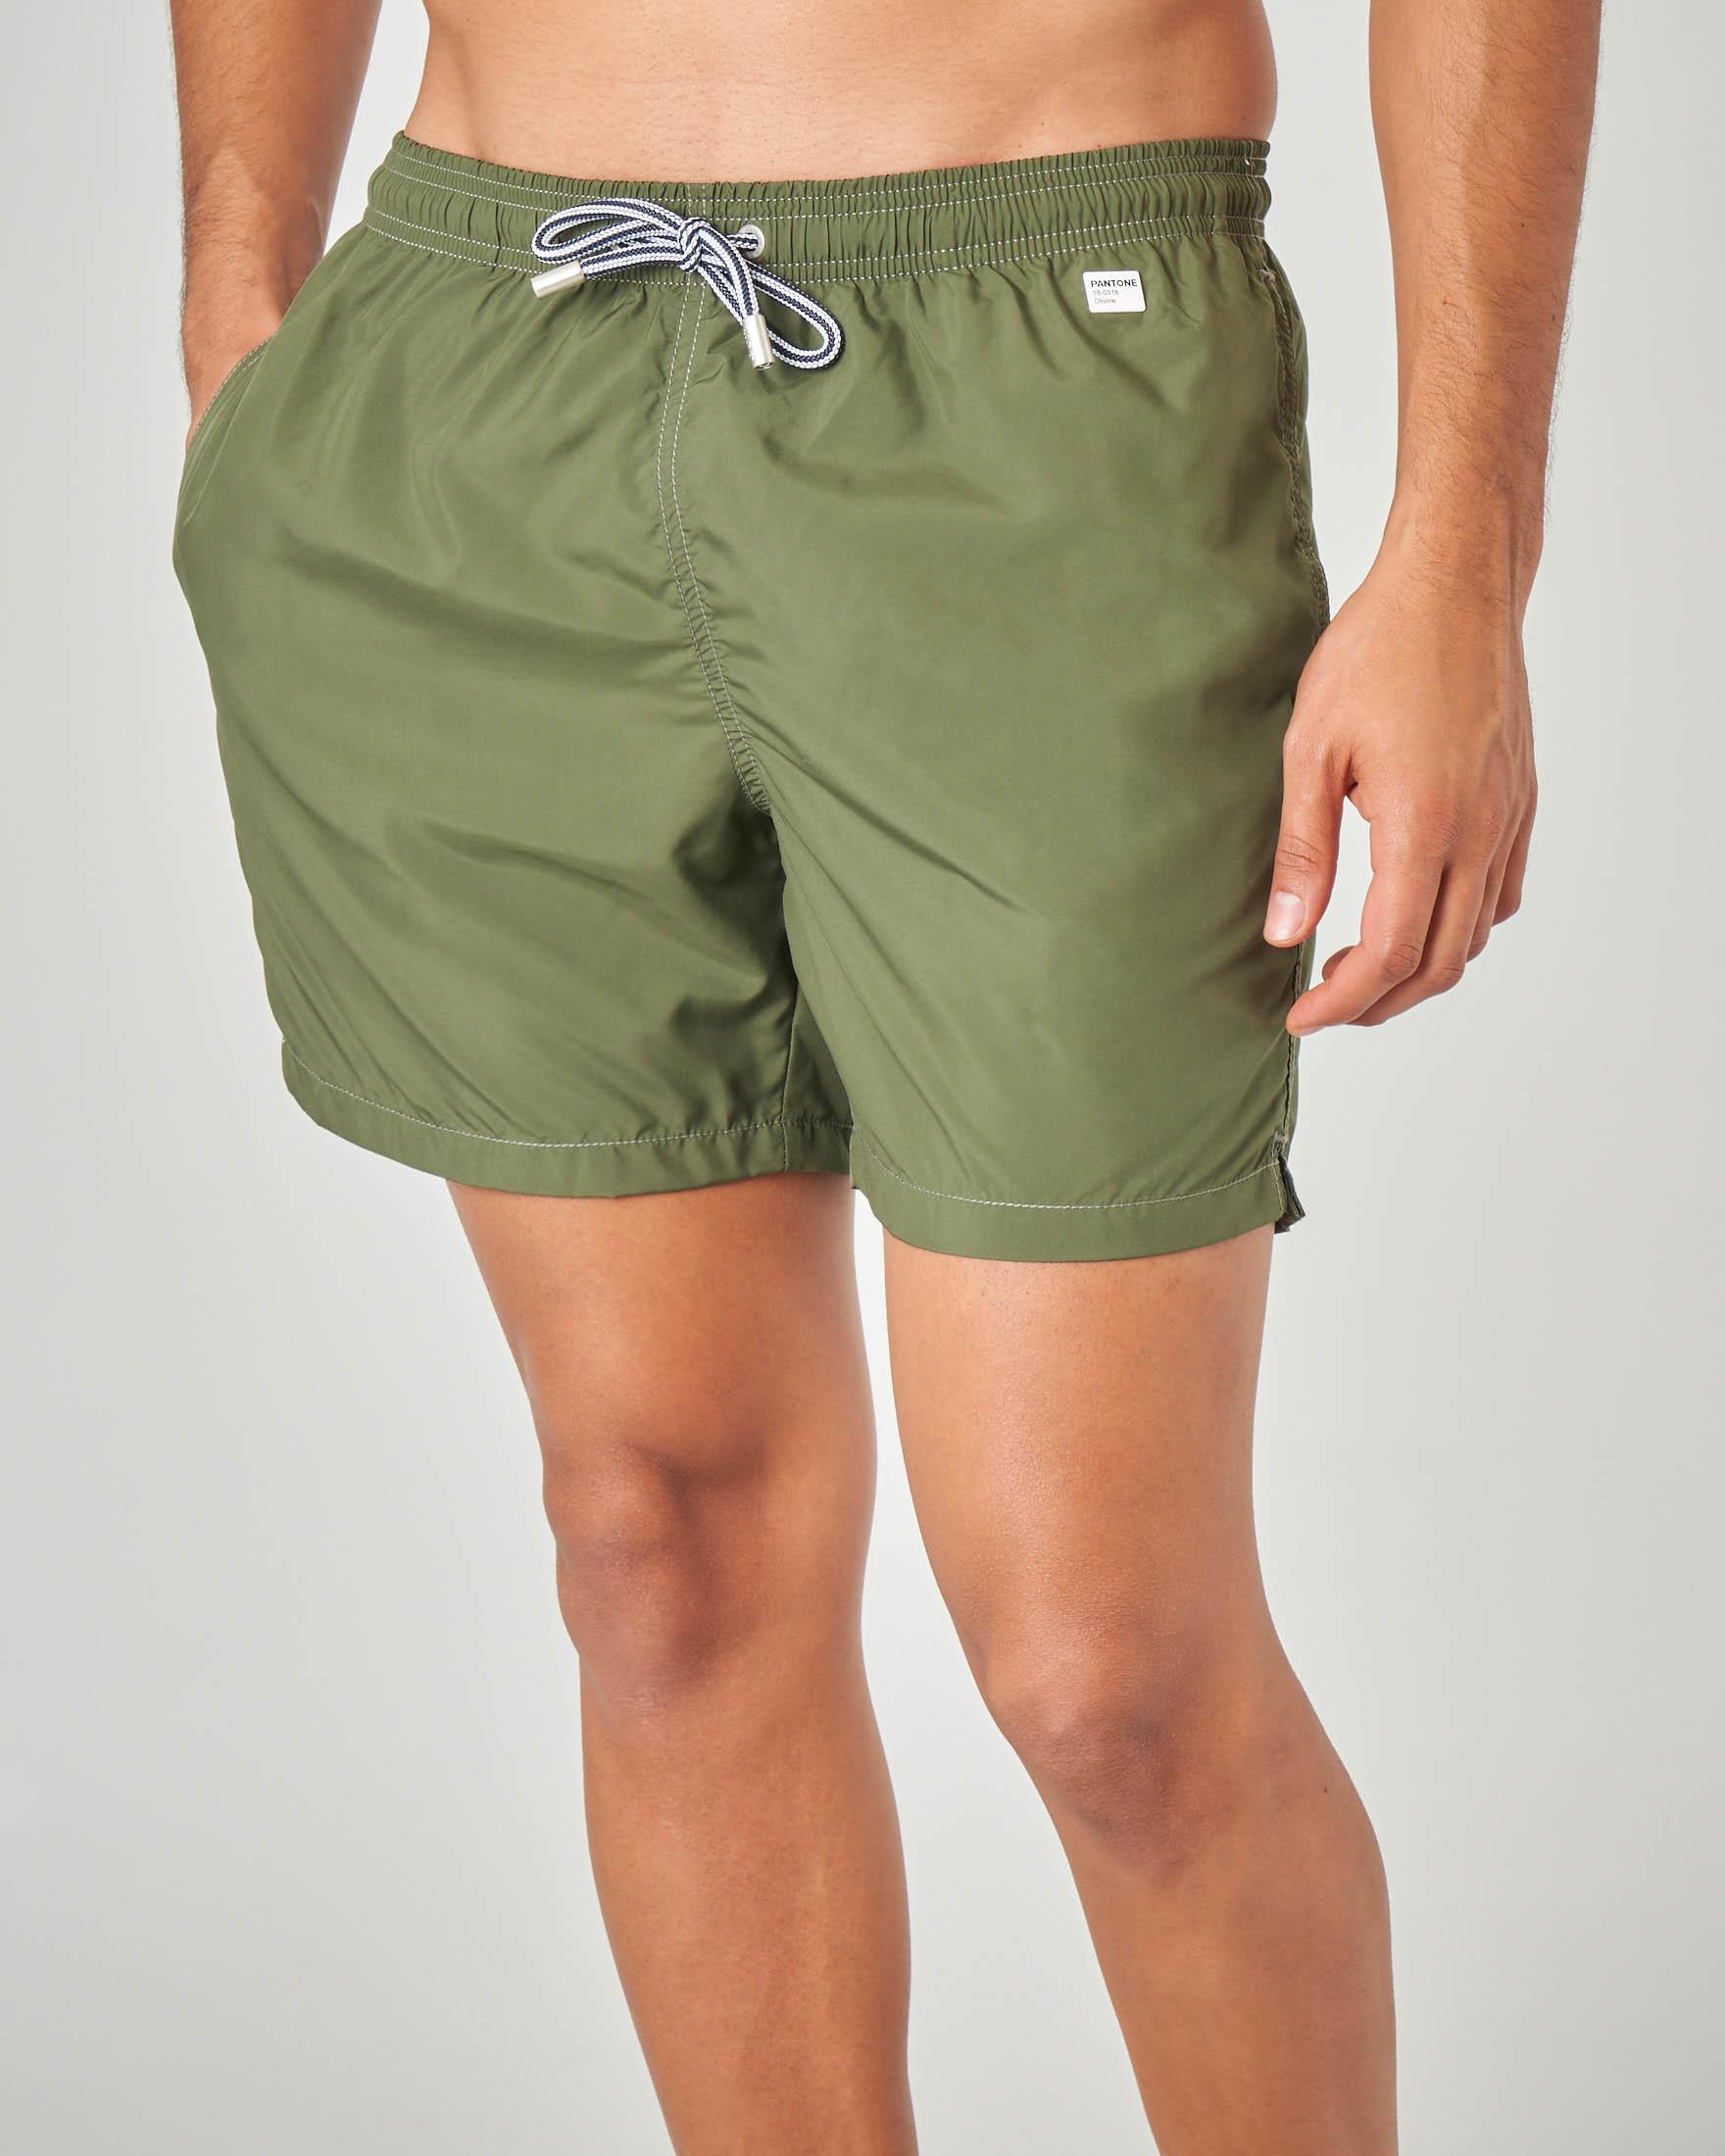 Boxer mare Pantone verde militare tinta unita